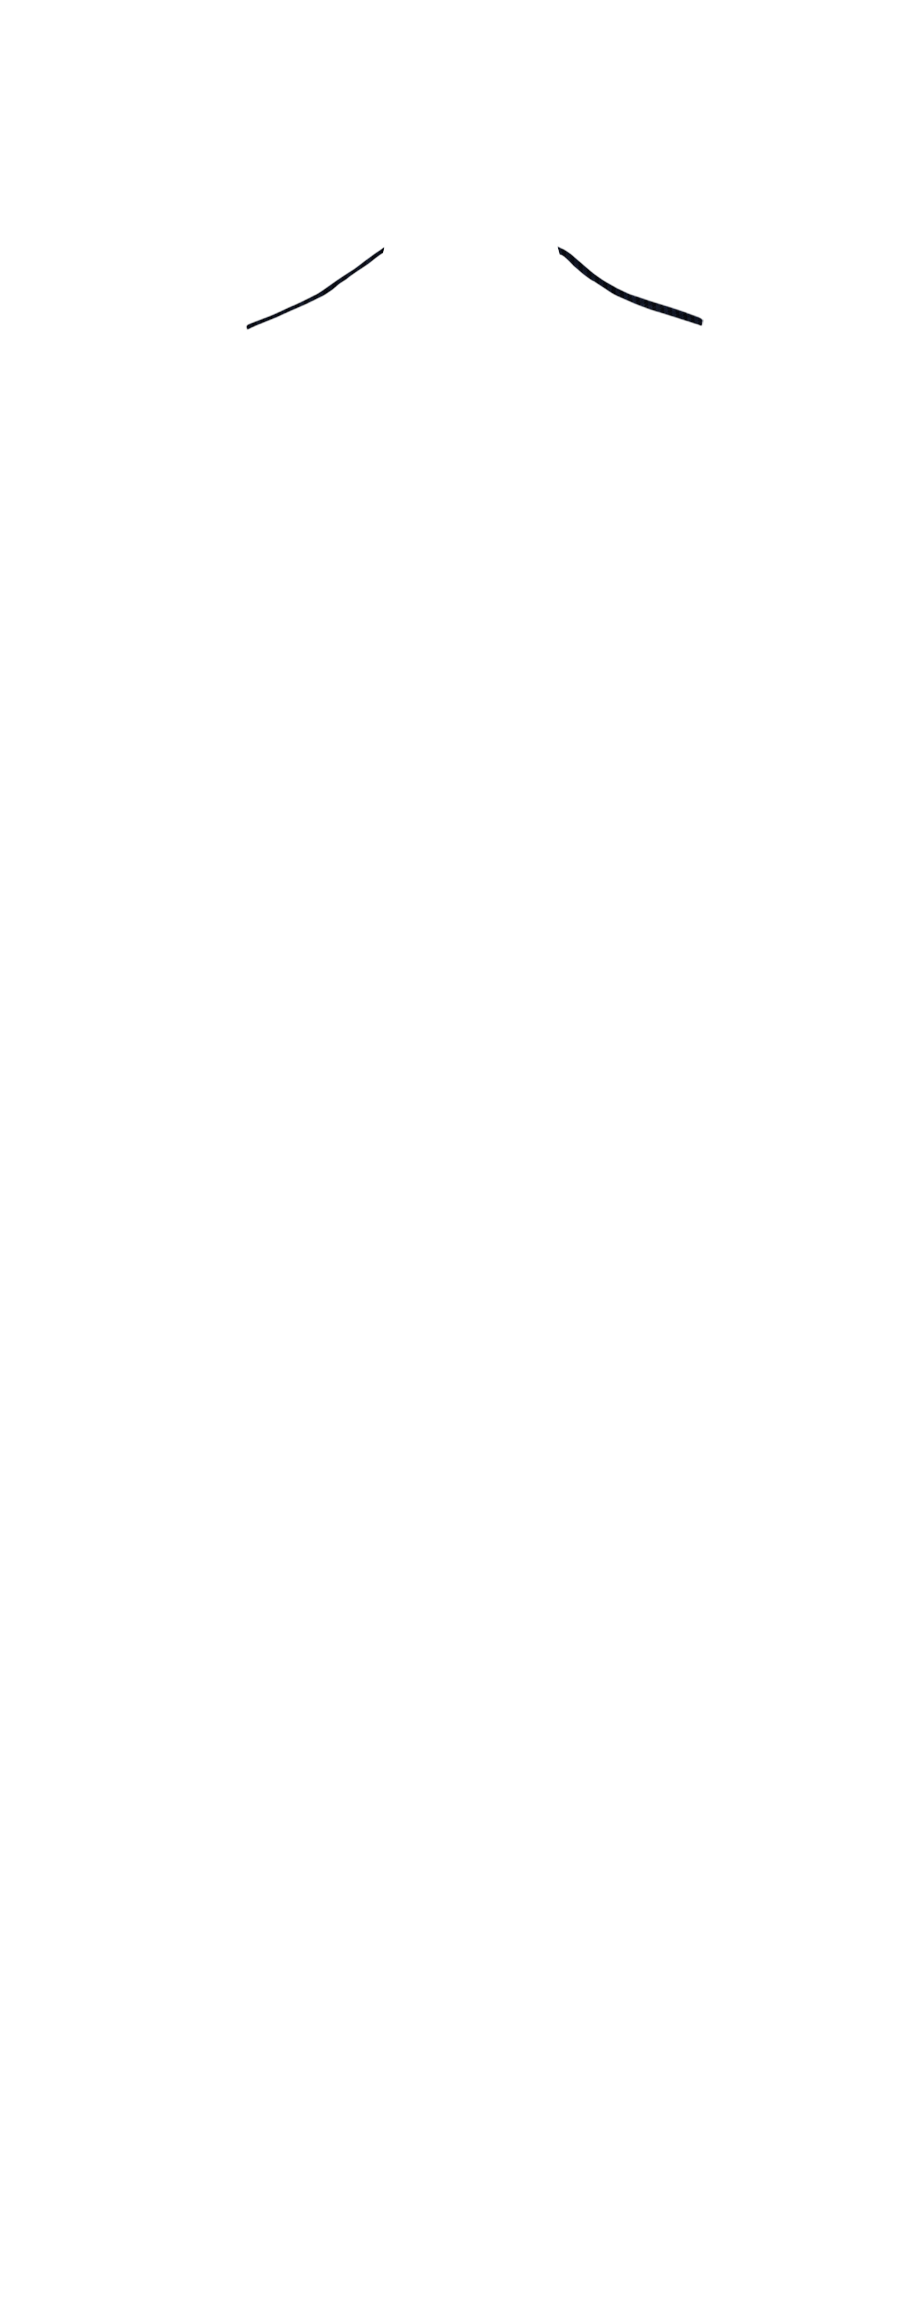 NEFL-4